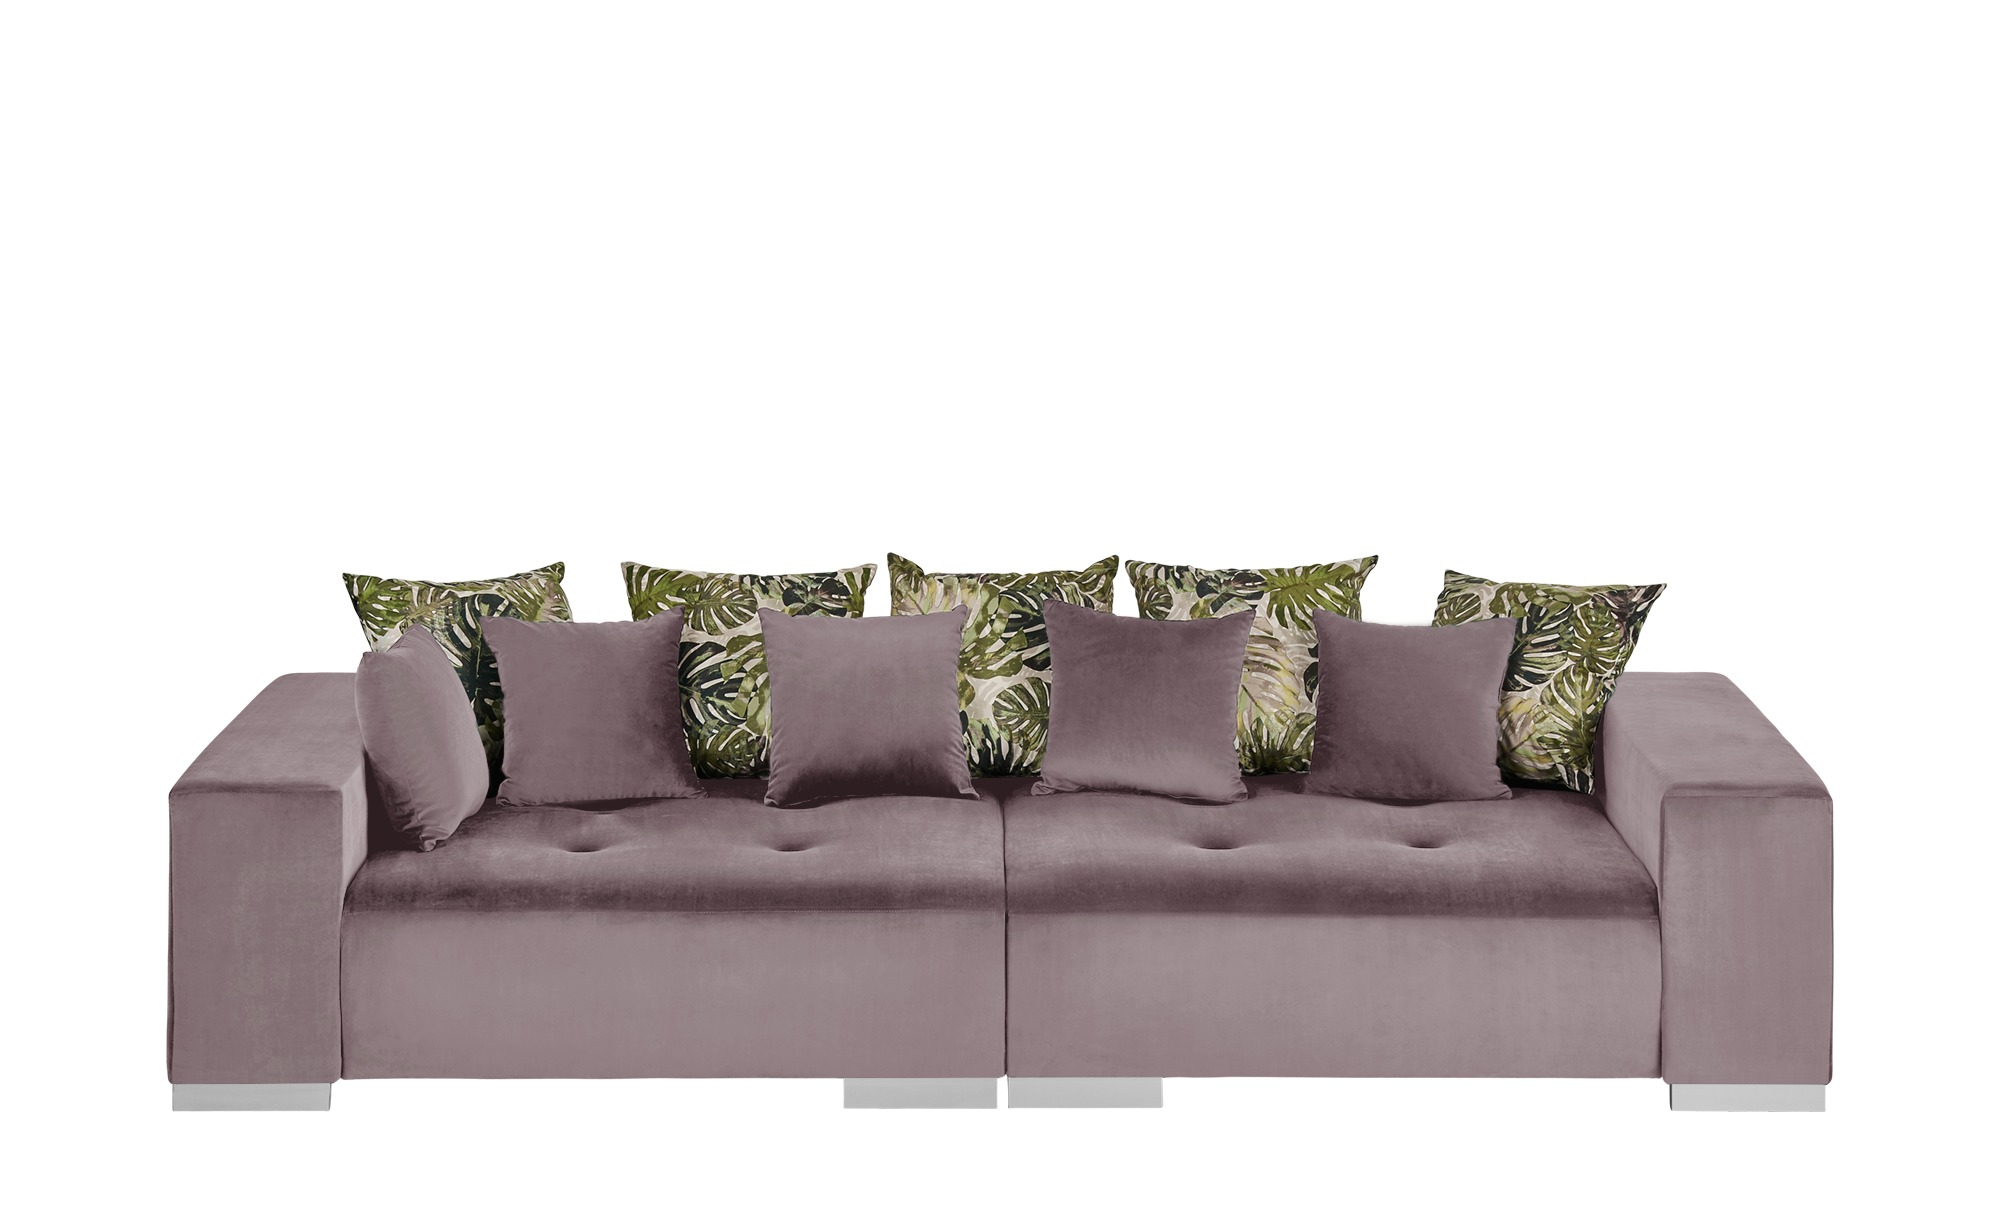 switch Big Sofa  Max ¦ rosa/pink ¦ Maße (cm): B: 300 H: 85 T: 136 Polstermöbel > Sofas > Big-Sofas - Höffner